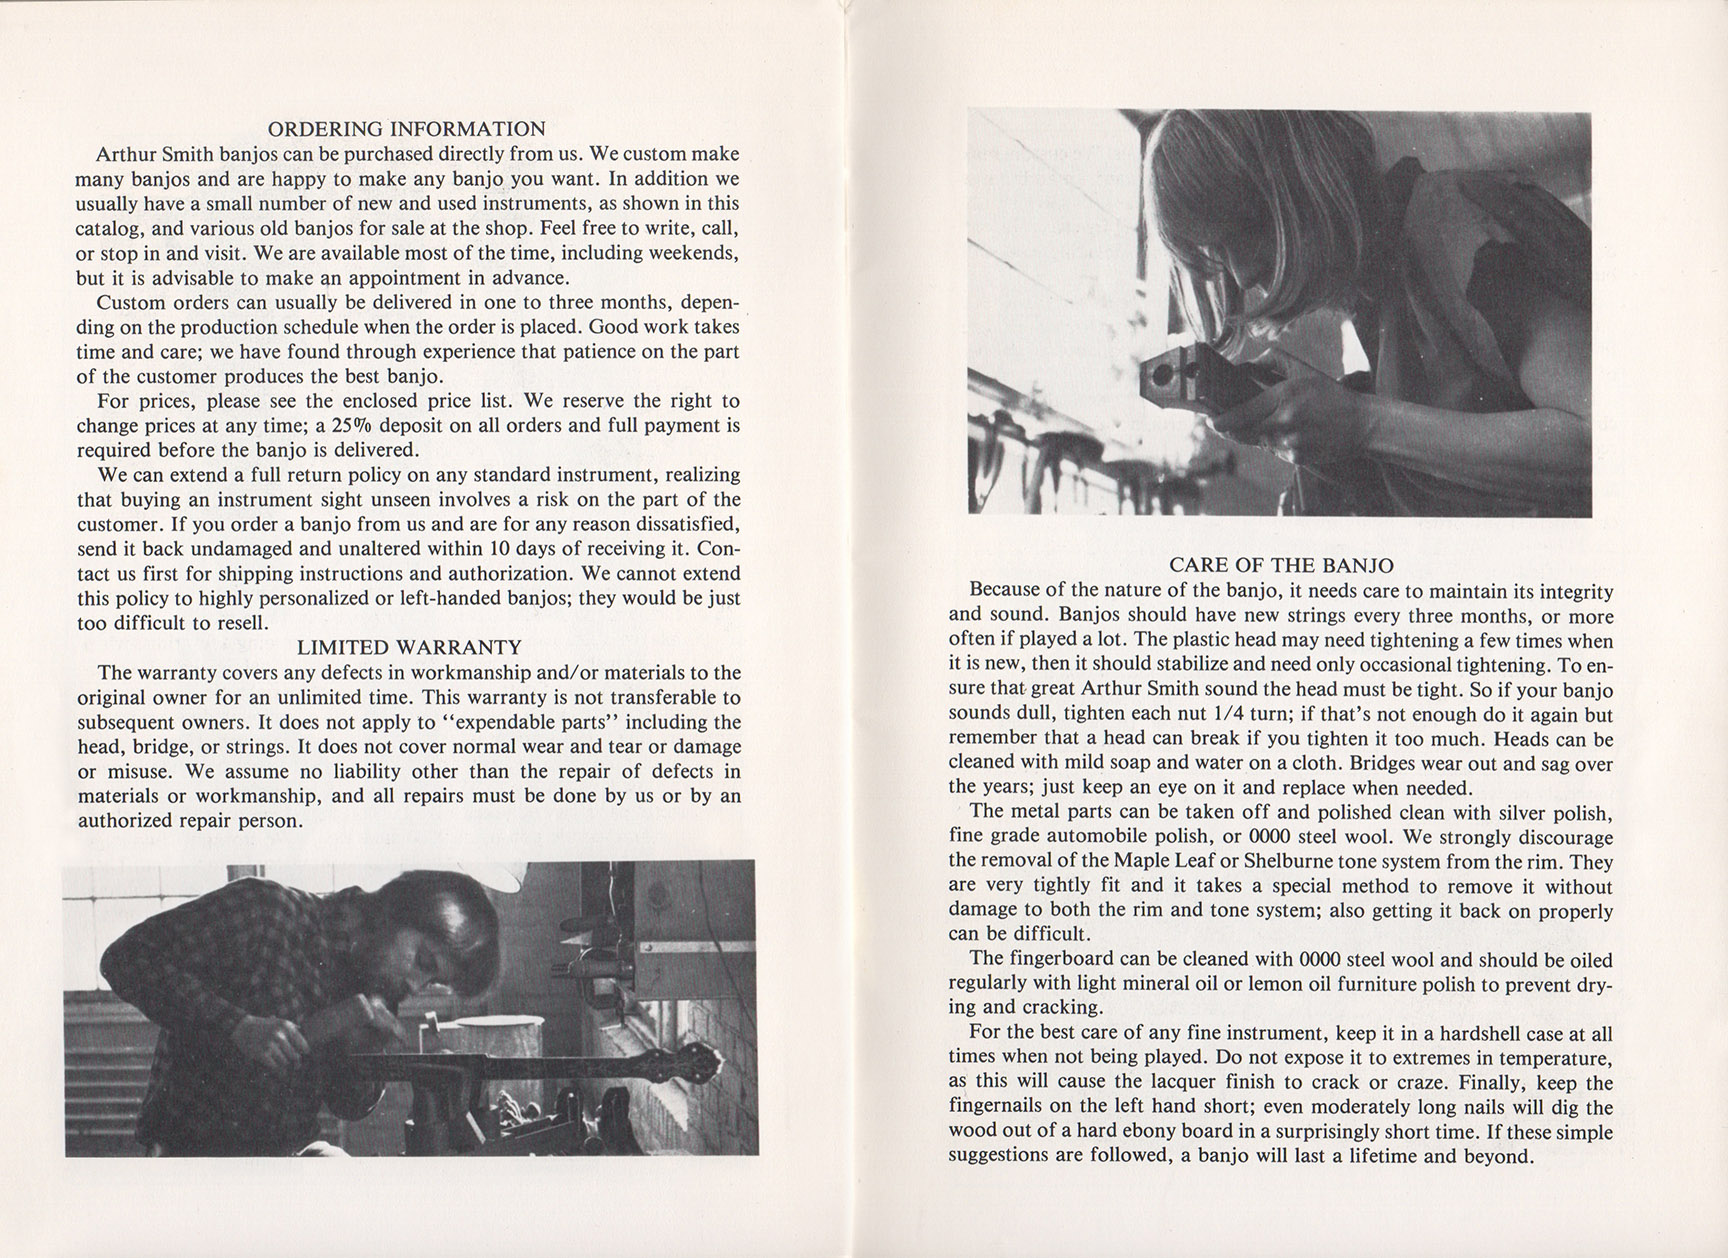 A E Smith Banjo Company Catalog page 8